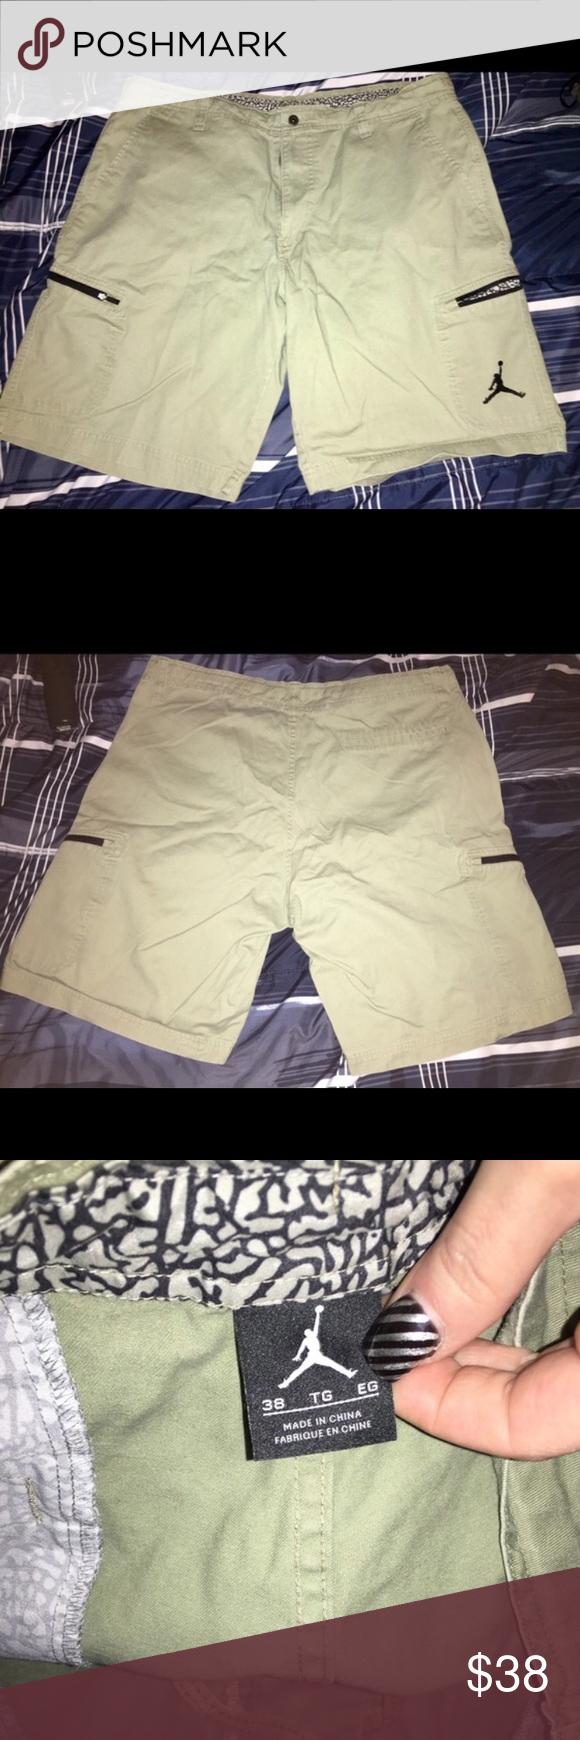 4bff12865c55d9 NWOT Jordan khaki shorts size 38 NWOT Men s Jordan Khaki shorts size 38